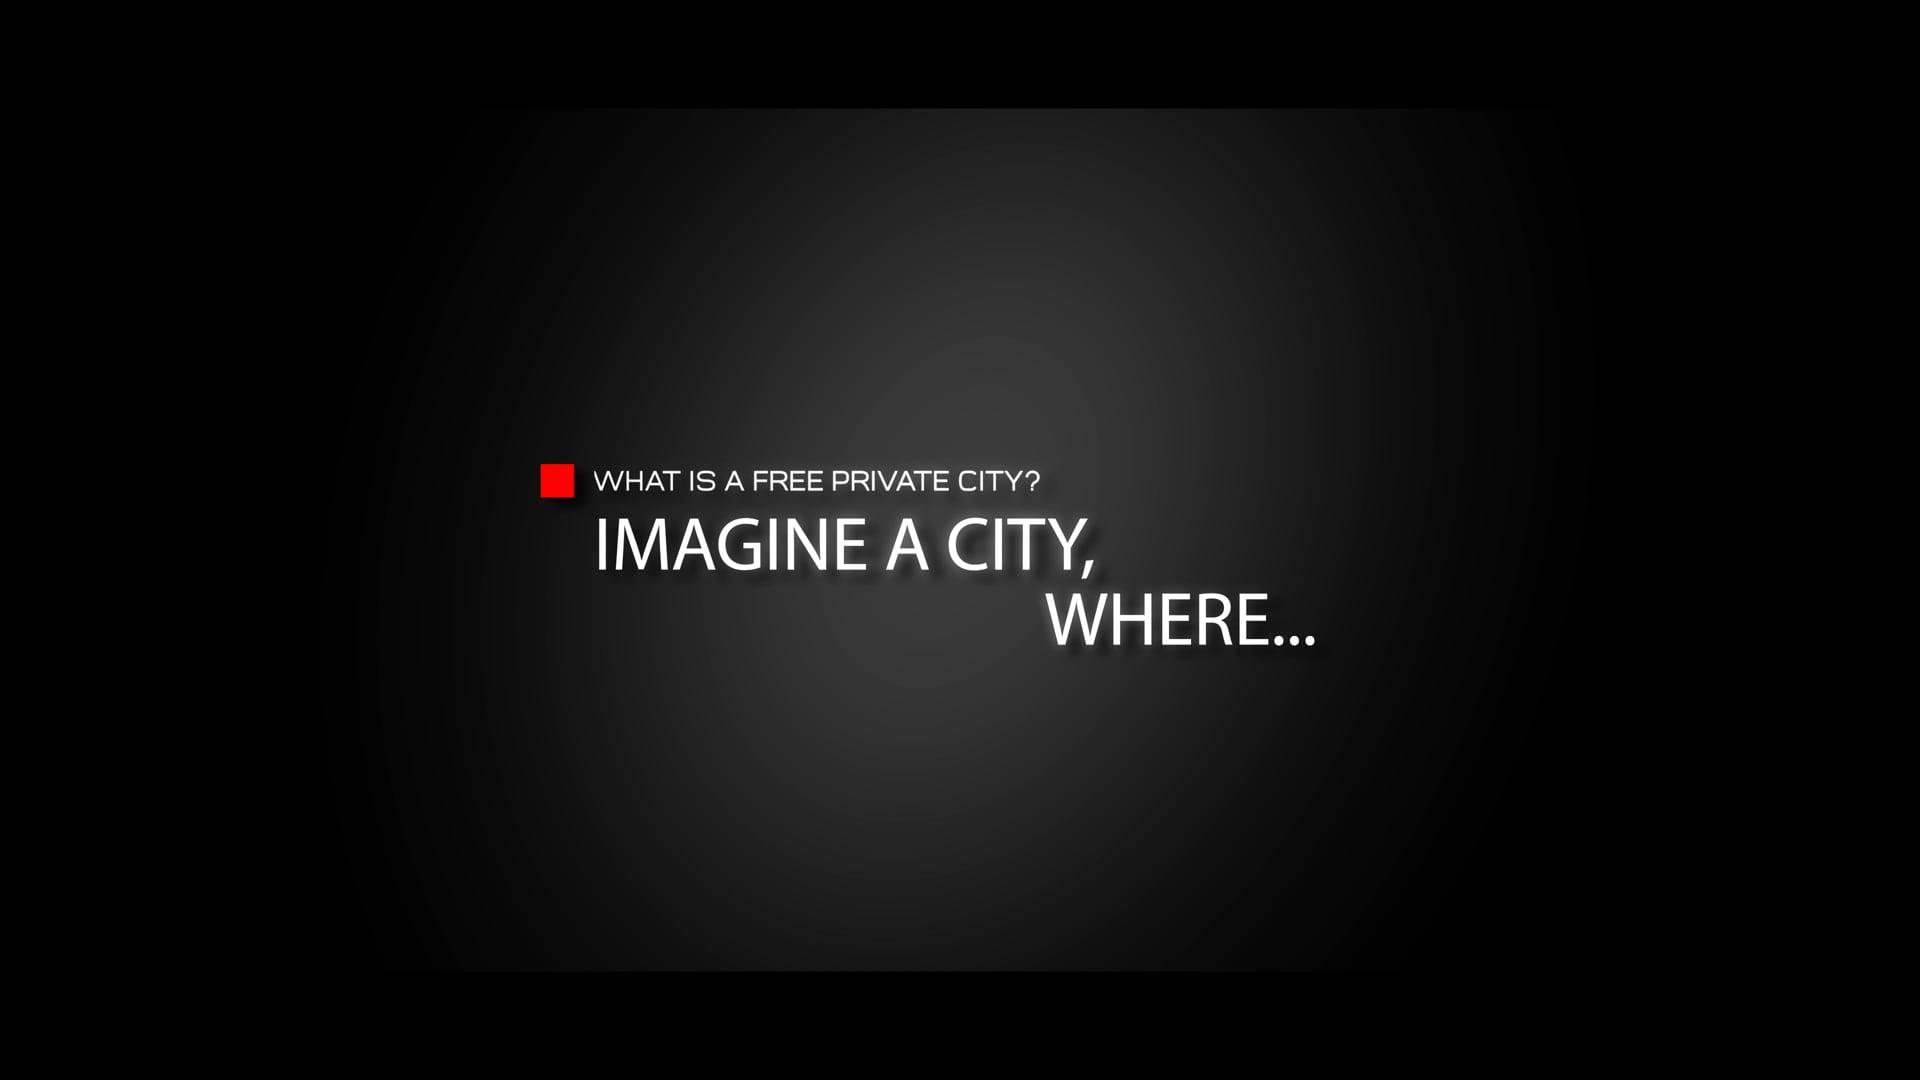 Imagine the Perfect City